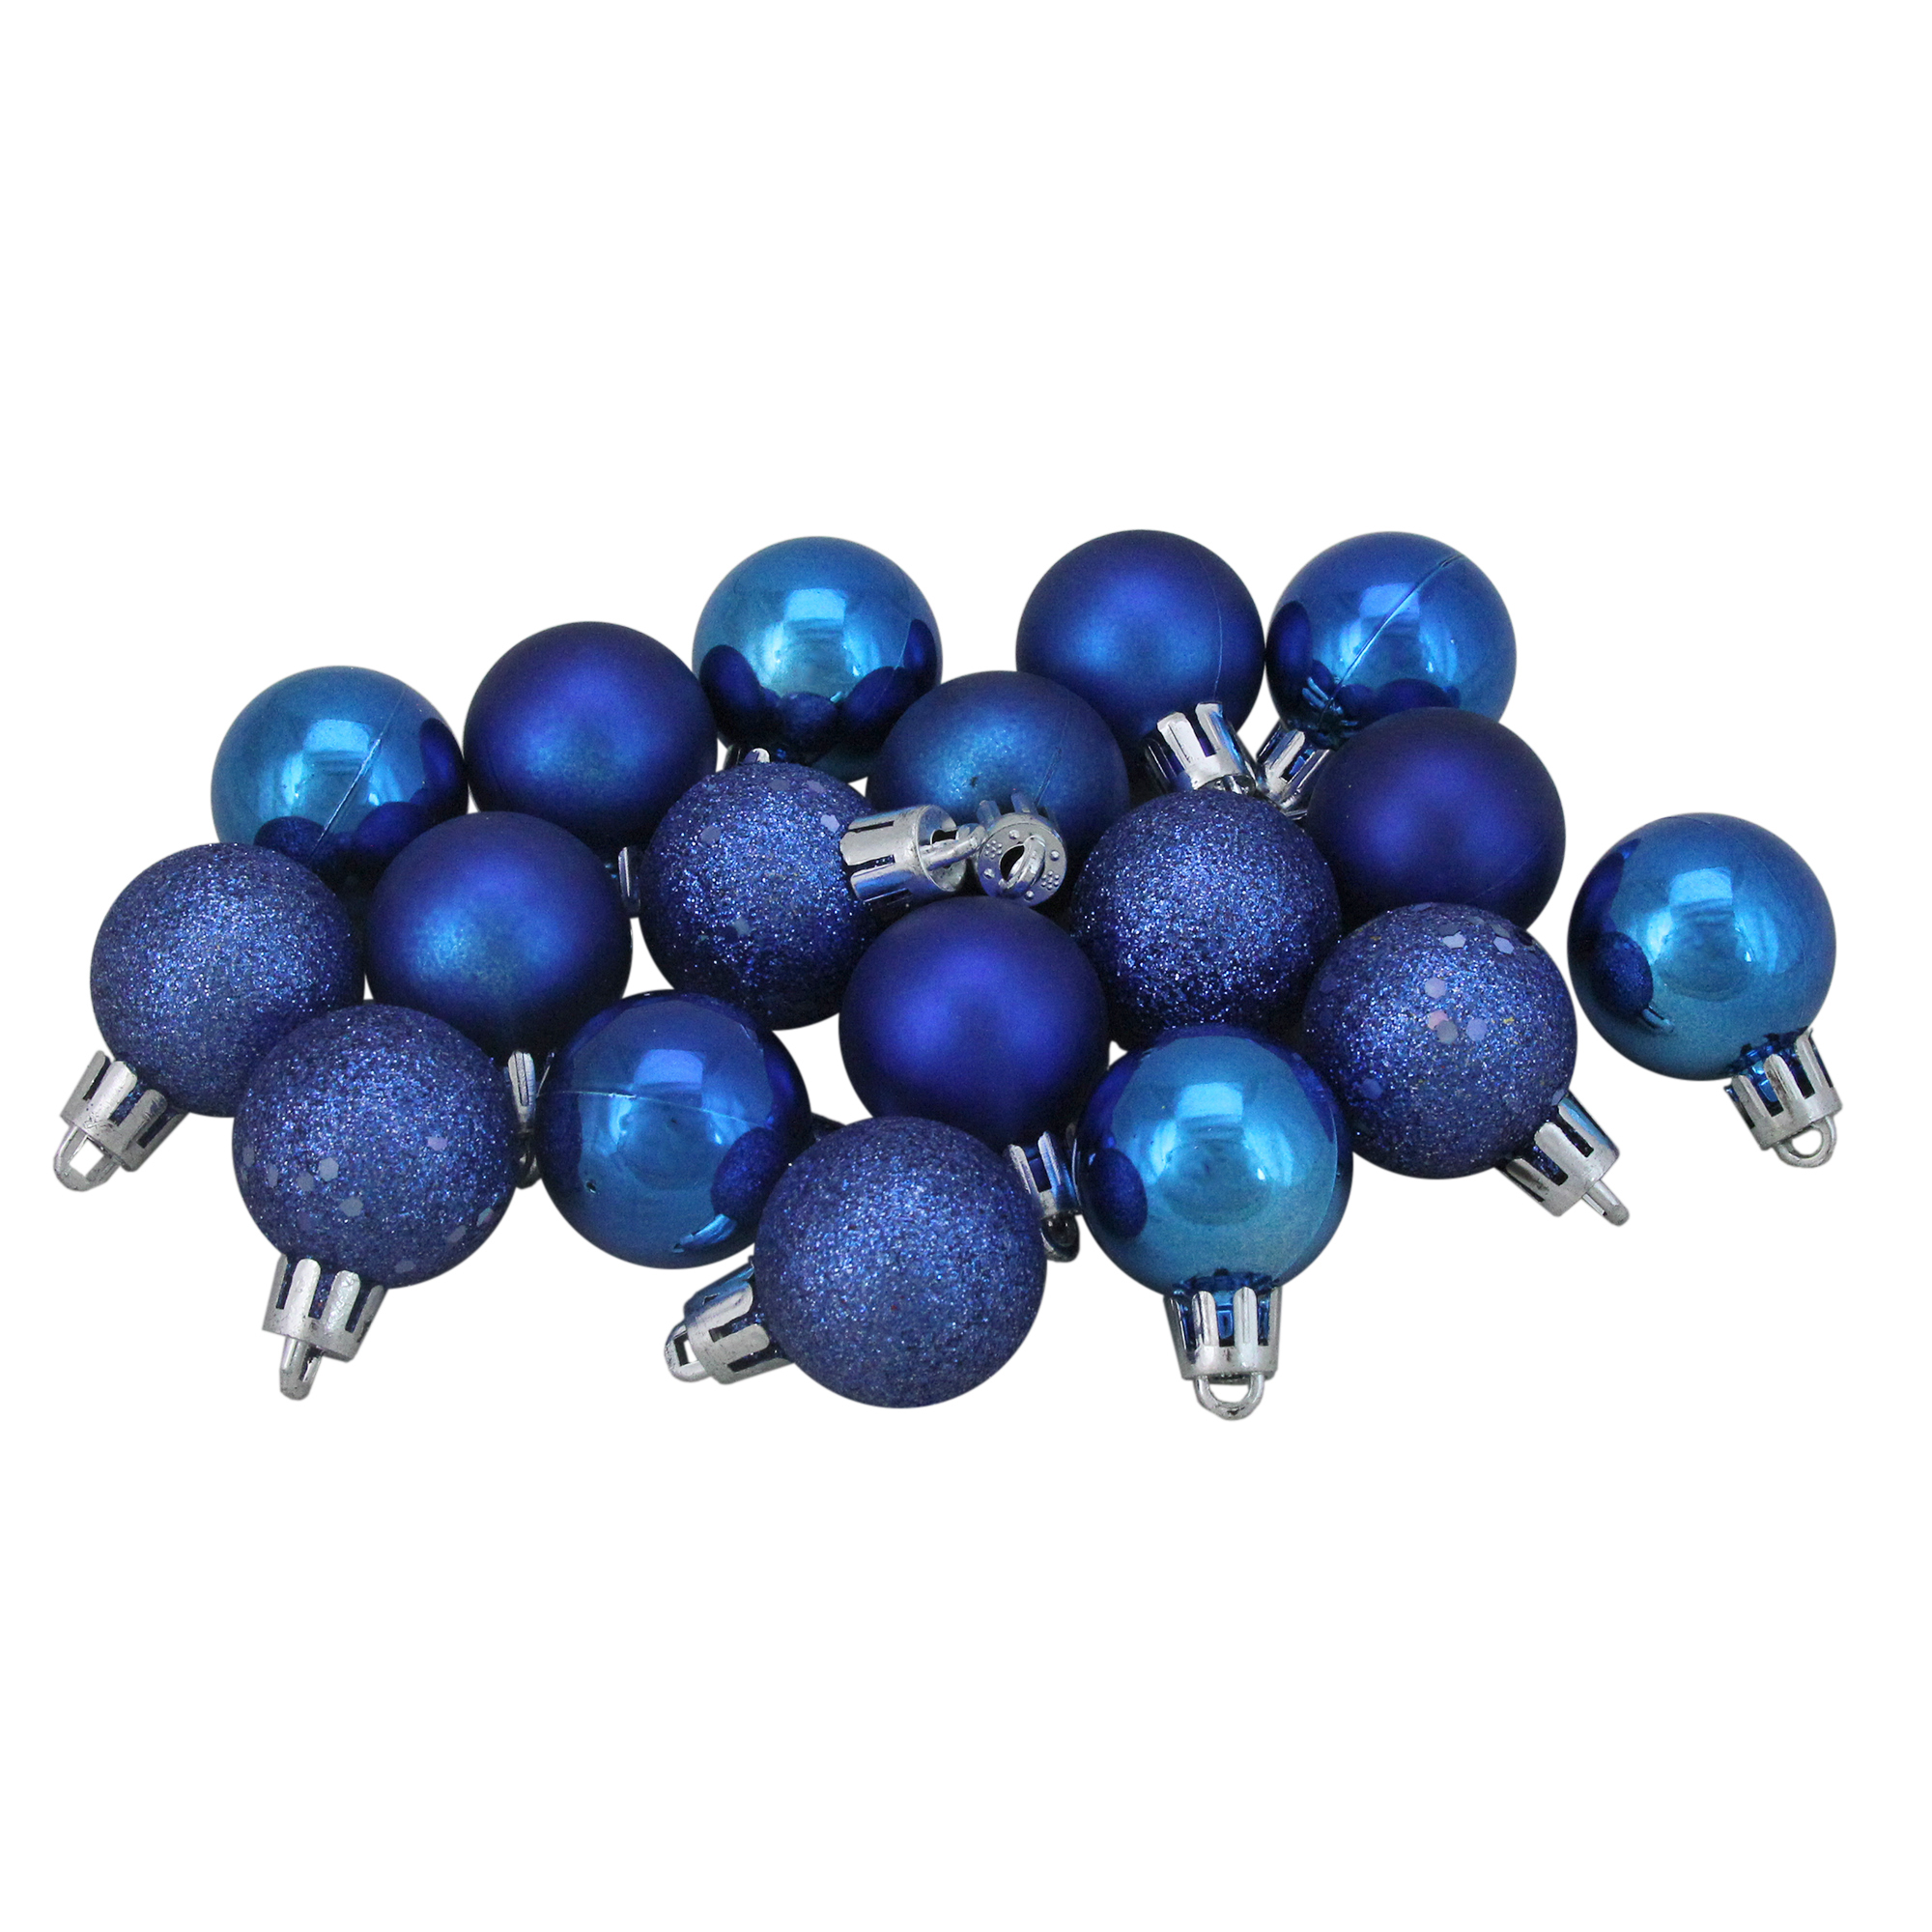 "18ct Shatterproof Lavish Blue 4-Finish Christmas Ball Ornaments 1.25"" (30mm)"